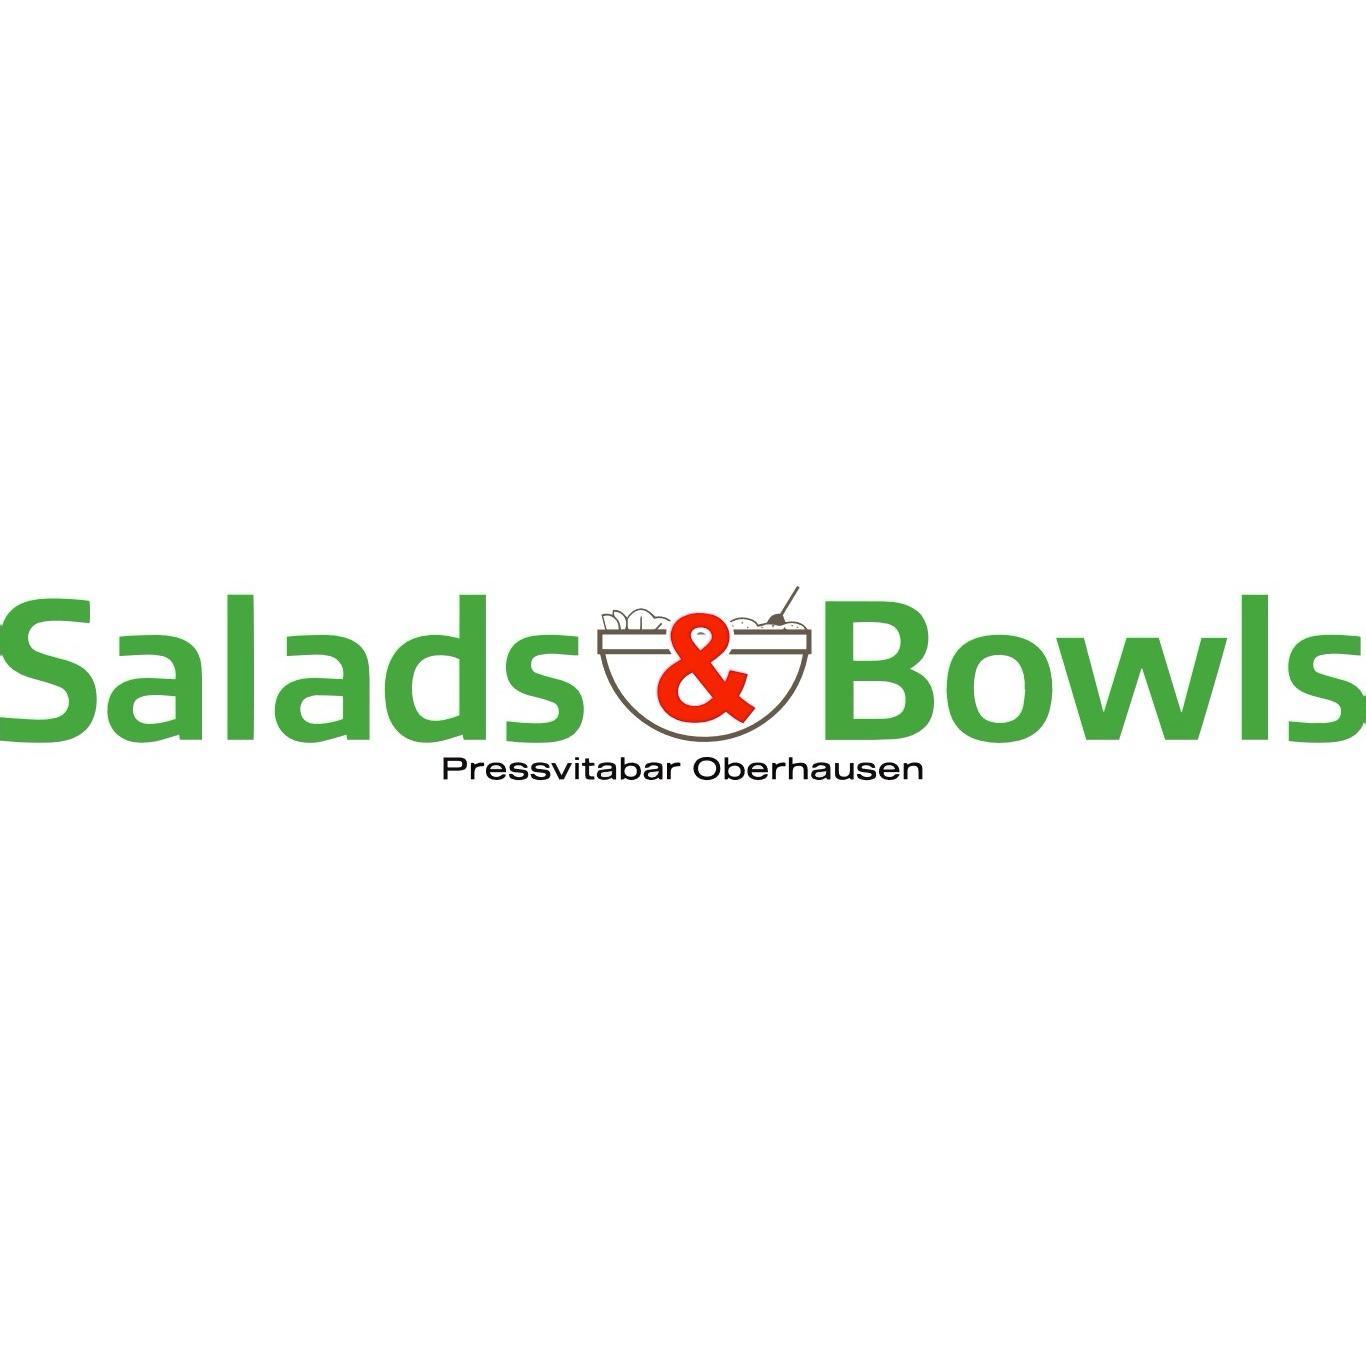 Salads&Bowls